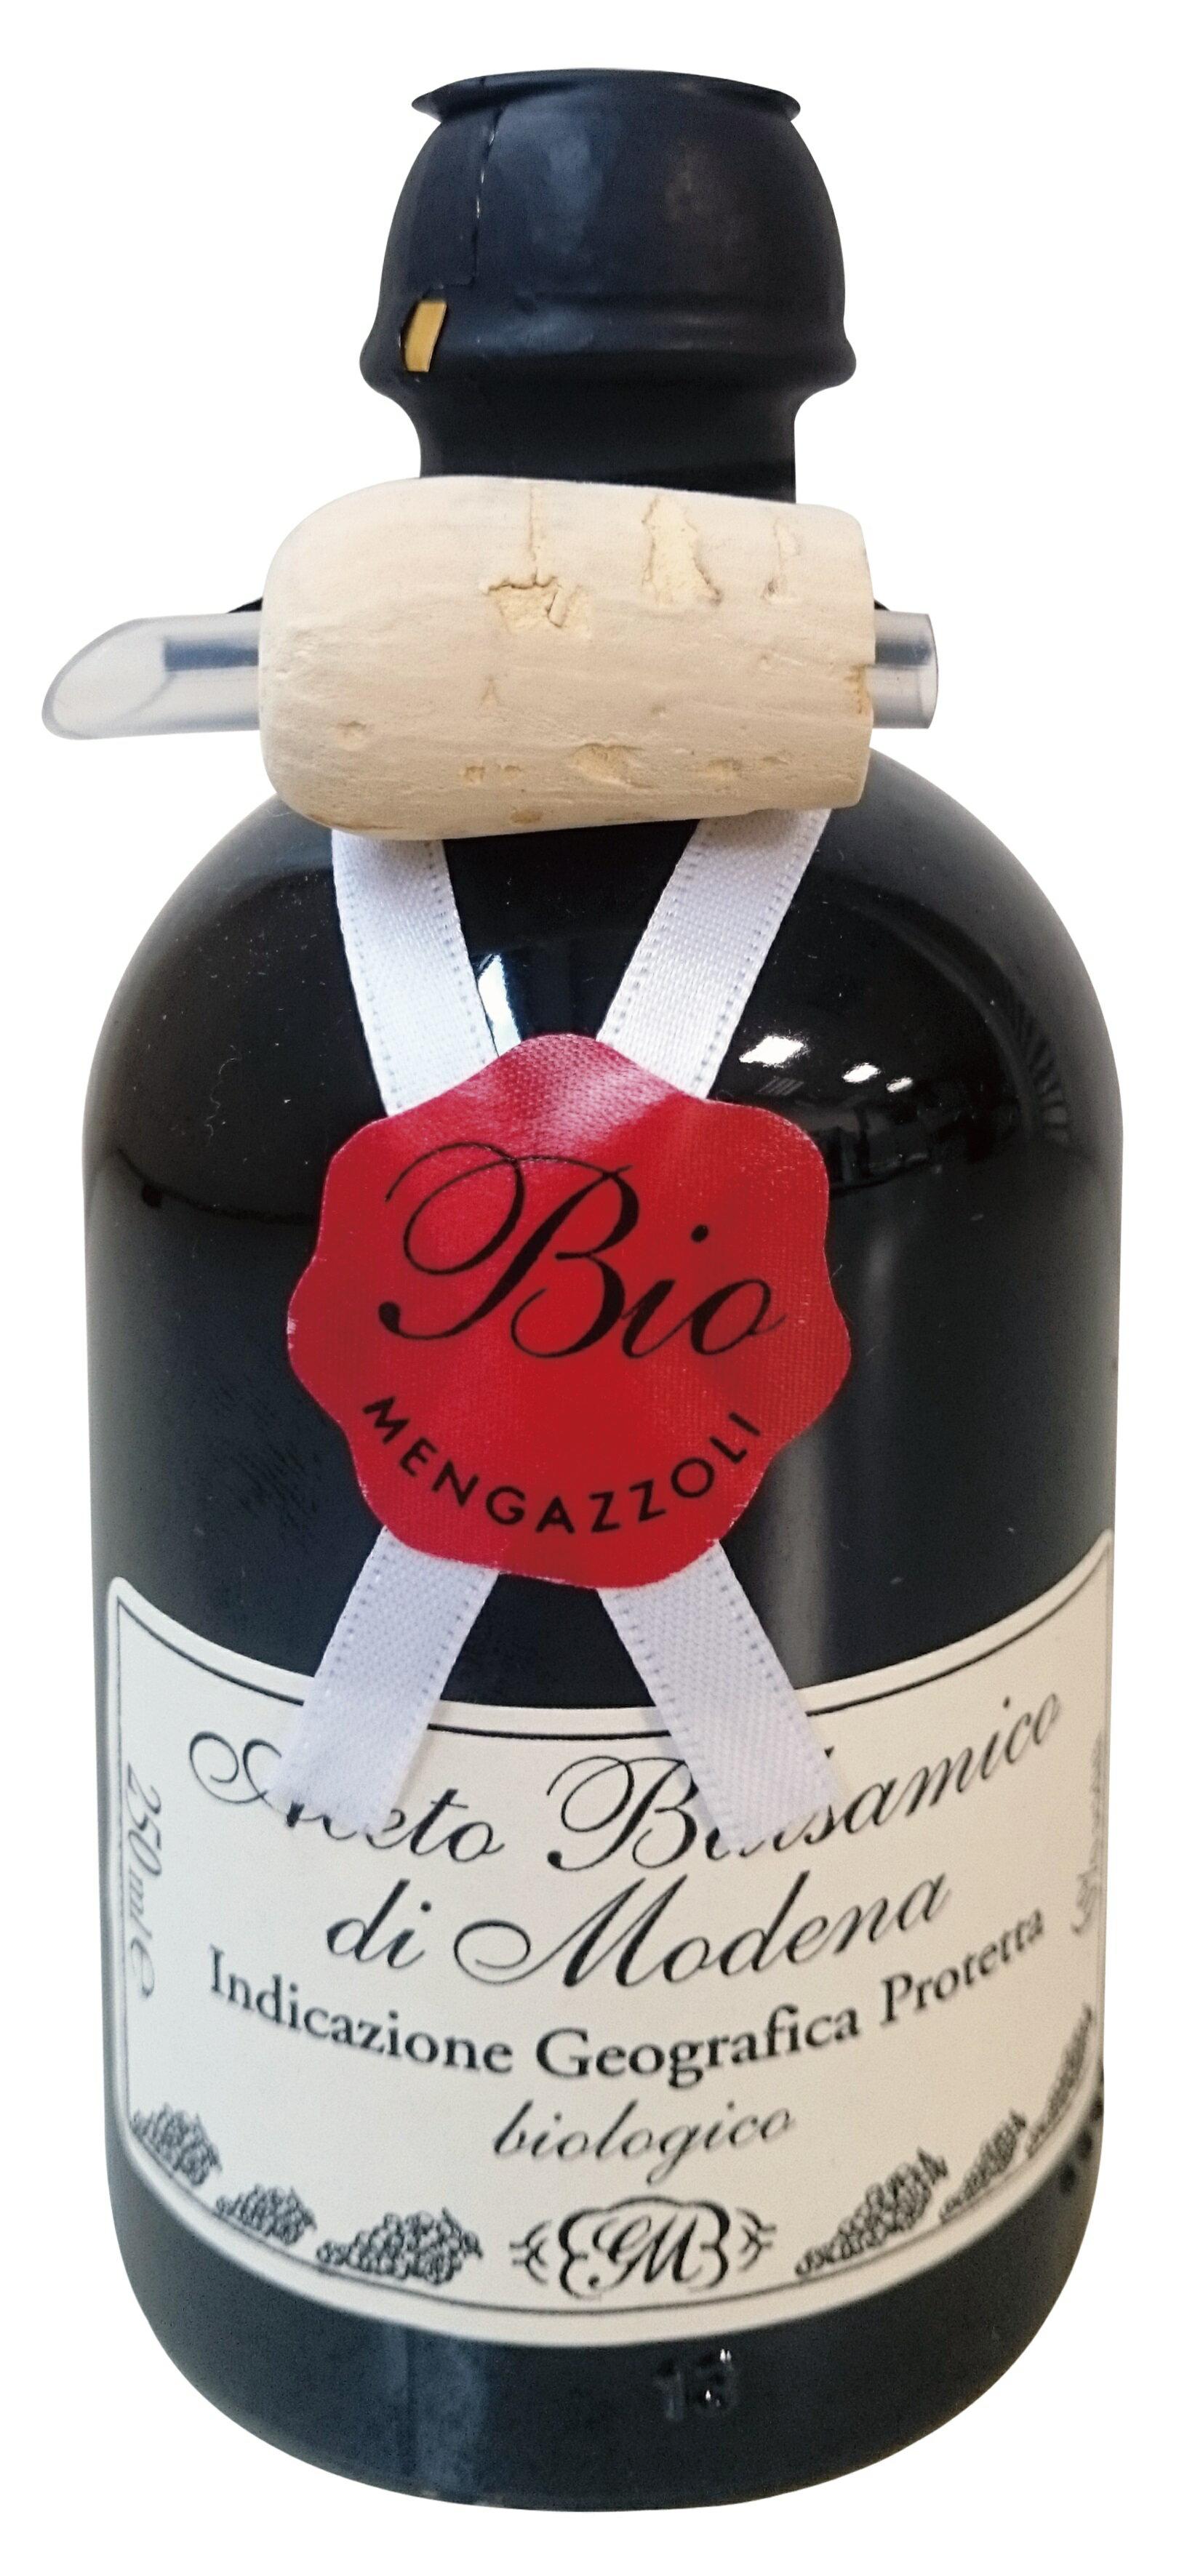 Mengazzoli 蒙加佐力★巴薩米克有機陳年老醋8年份★【250ml*1瓶】